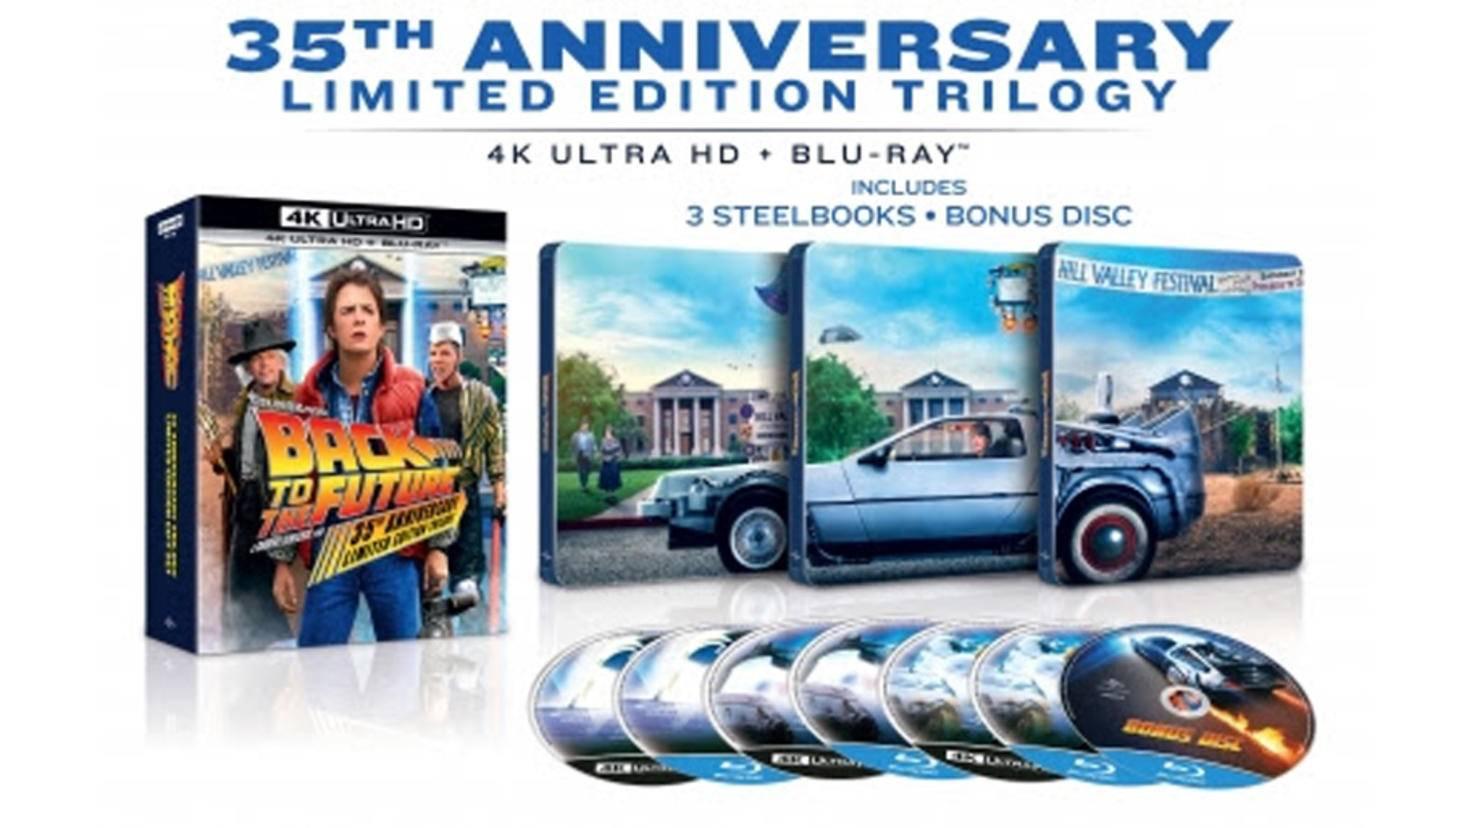 zurueck in die zukunft trilogie 4 k ultra HD